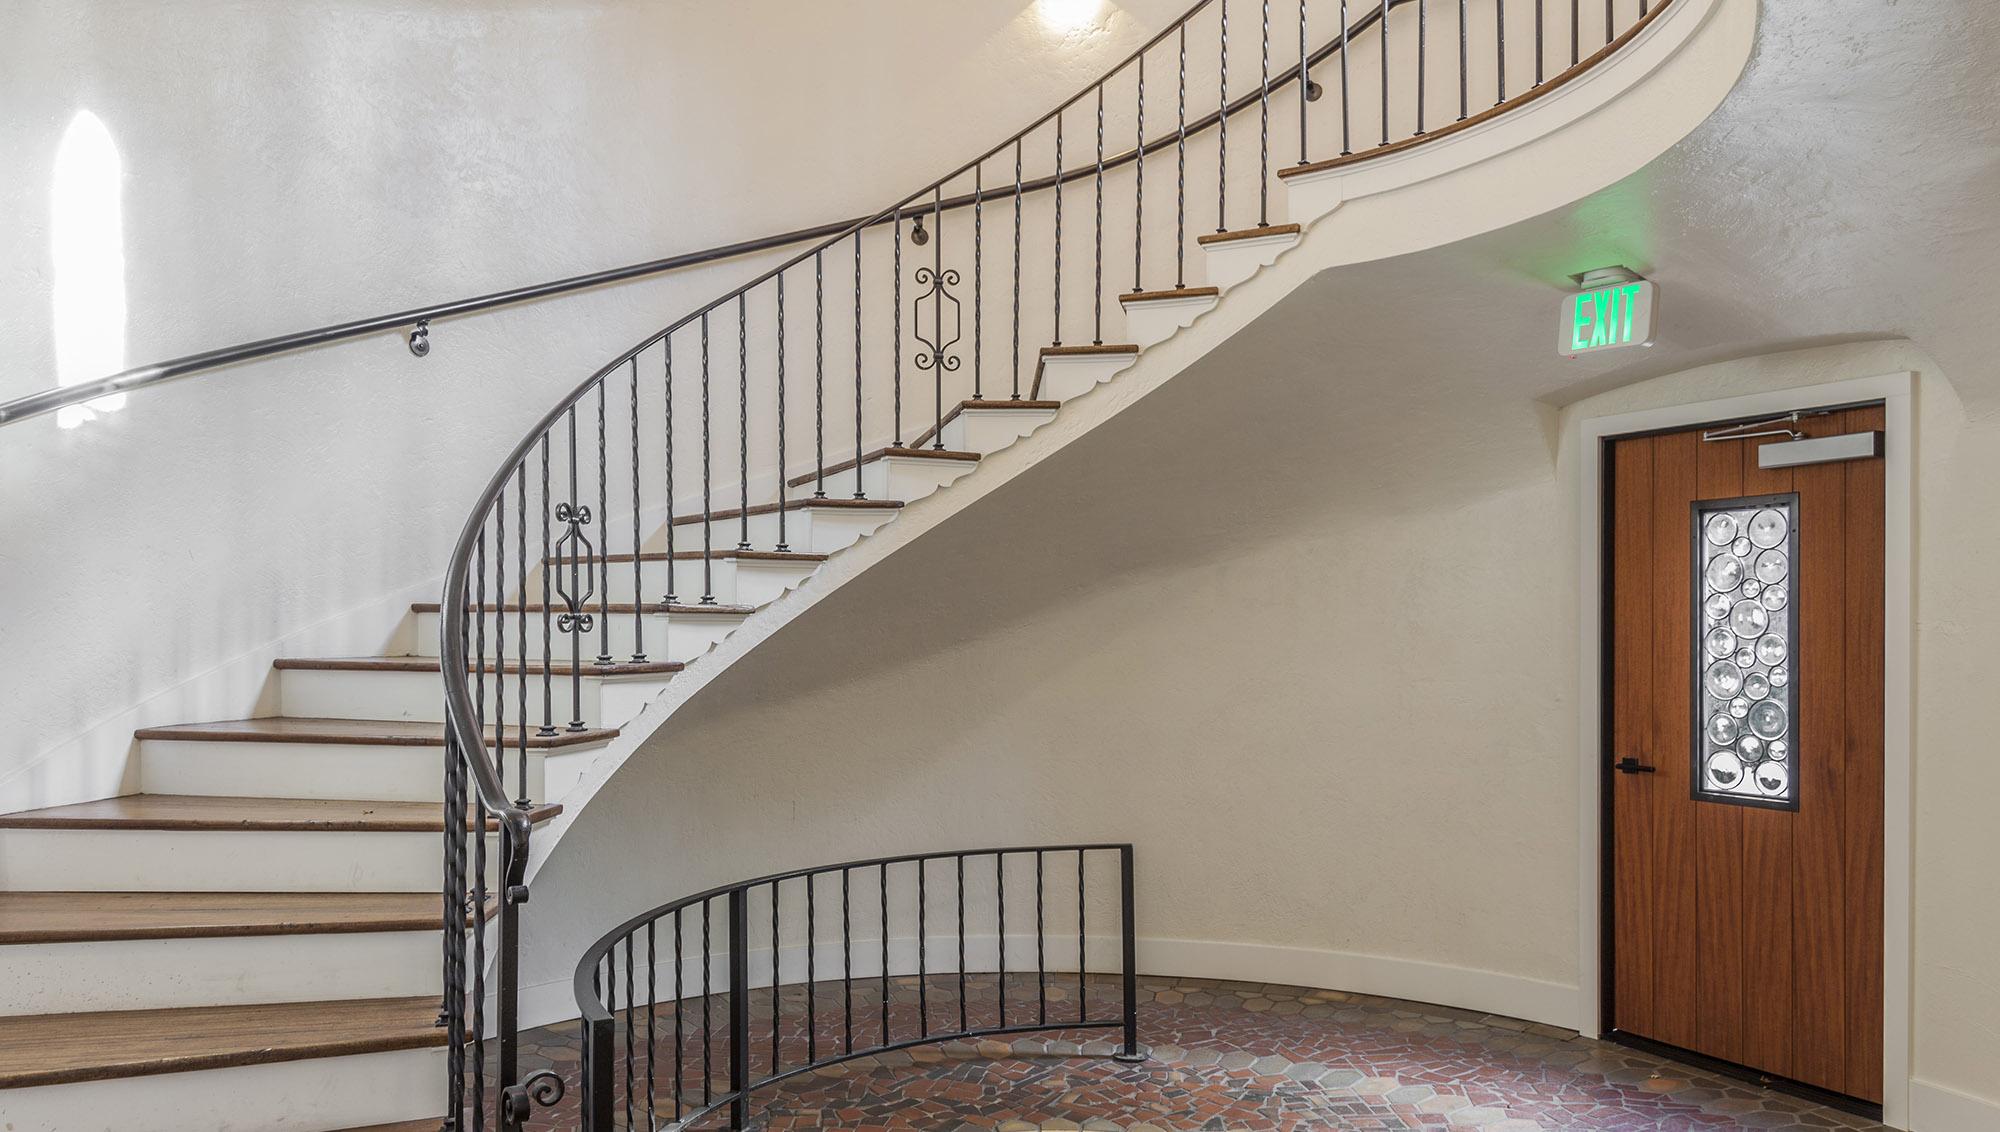 02 - New Stairway 1